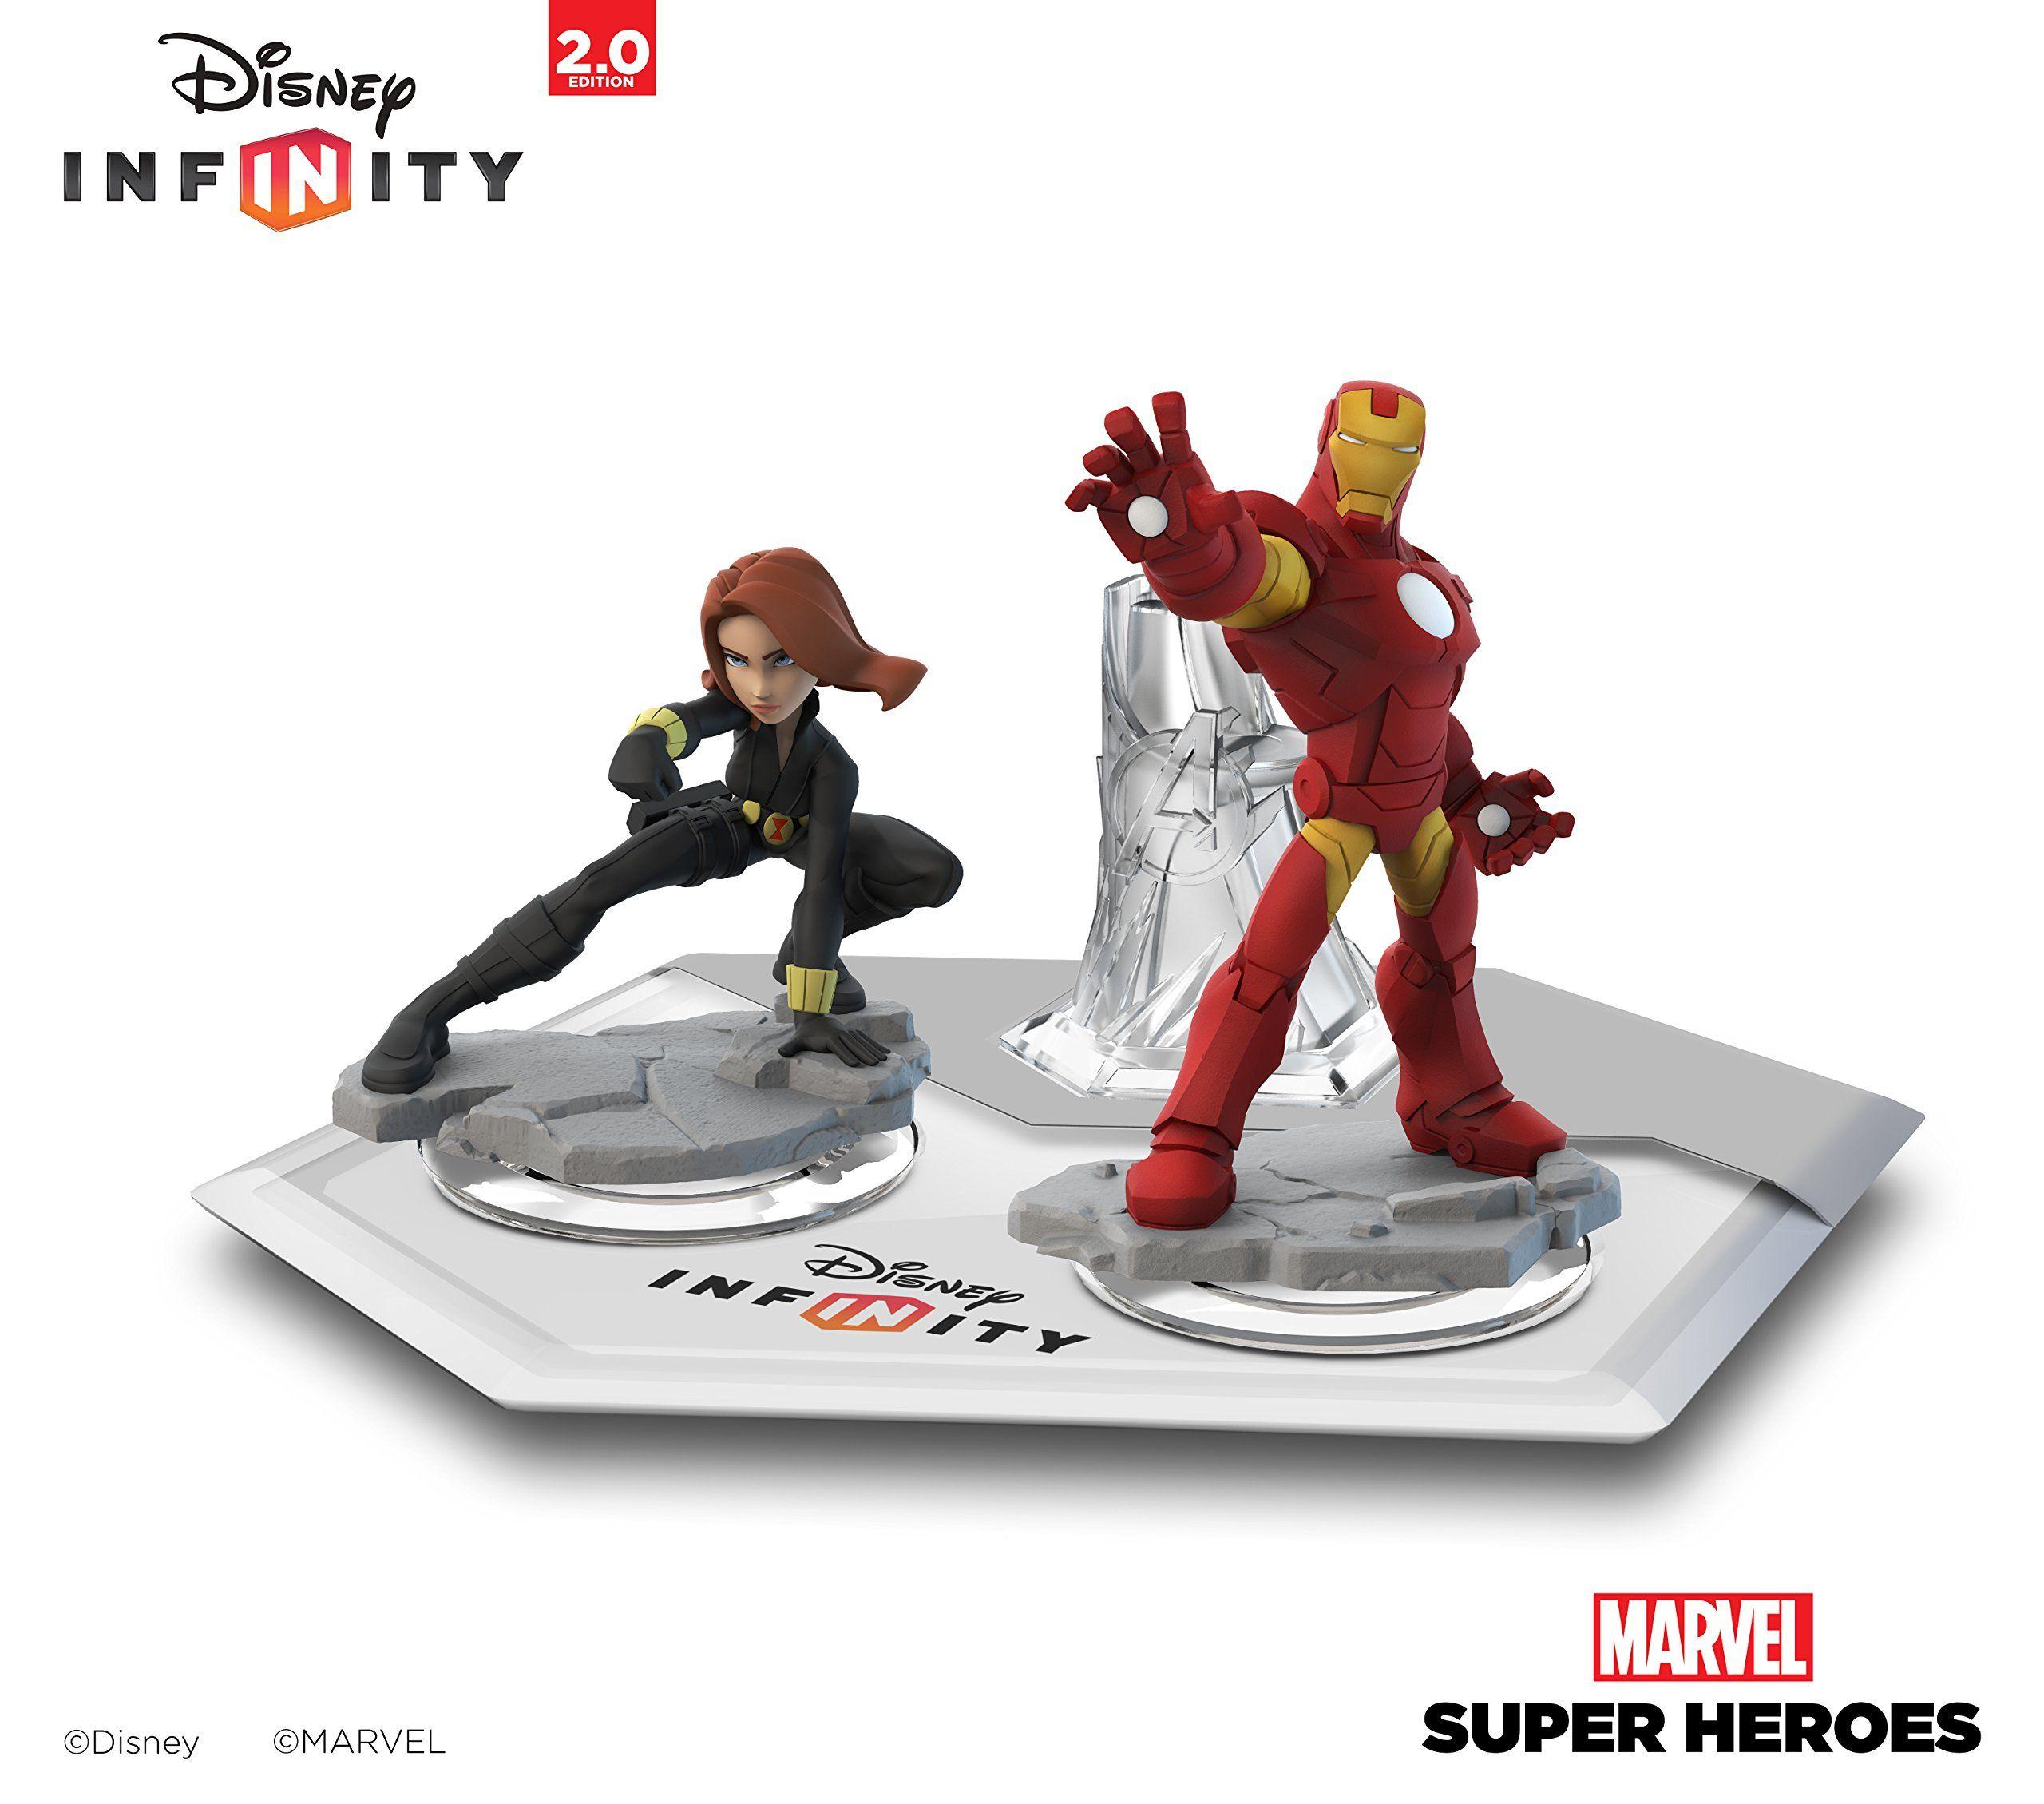 Disney Infinity Marvel Super Heroes 2 0 Edition Video Game Starter Pack Playstation 3 Detail Disney Infinity Disney Interactive Disney Infinity Characters